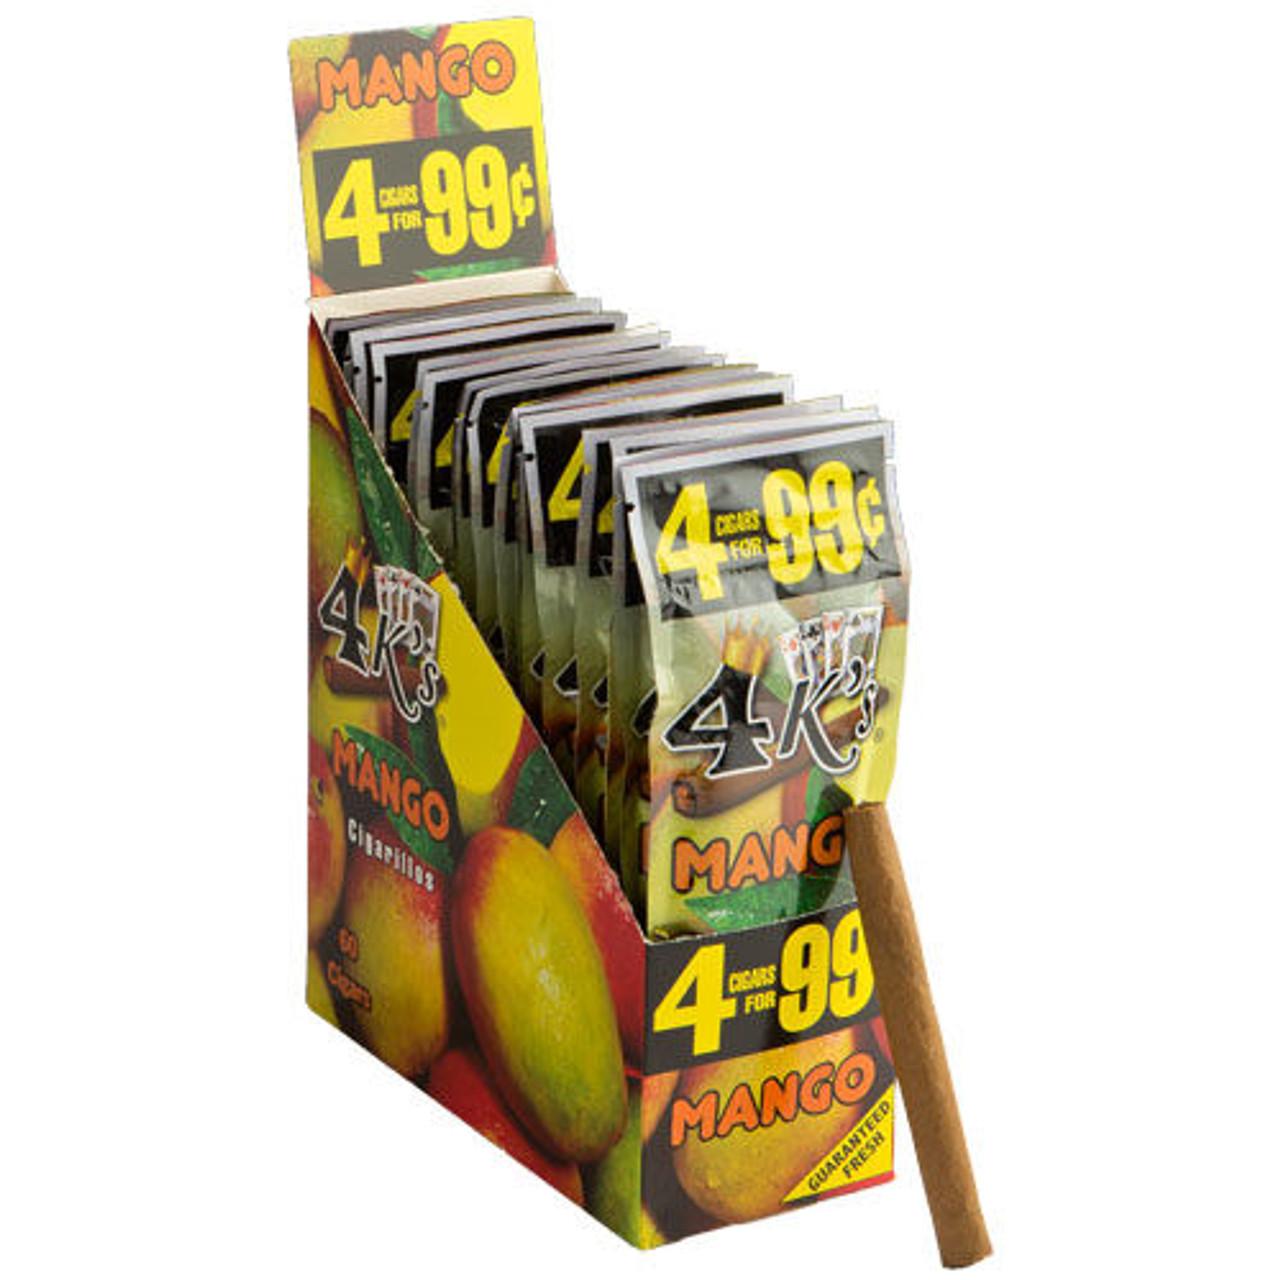 Good Times 4 K's Cigarillos Mango Cigars - 4.25 x 28 (15 Packs of 4 (60 Total))